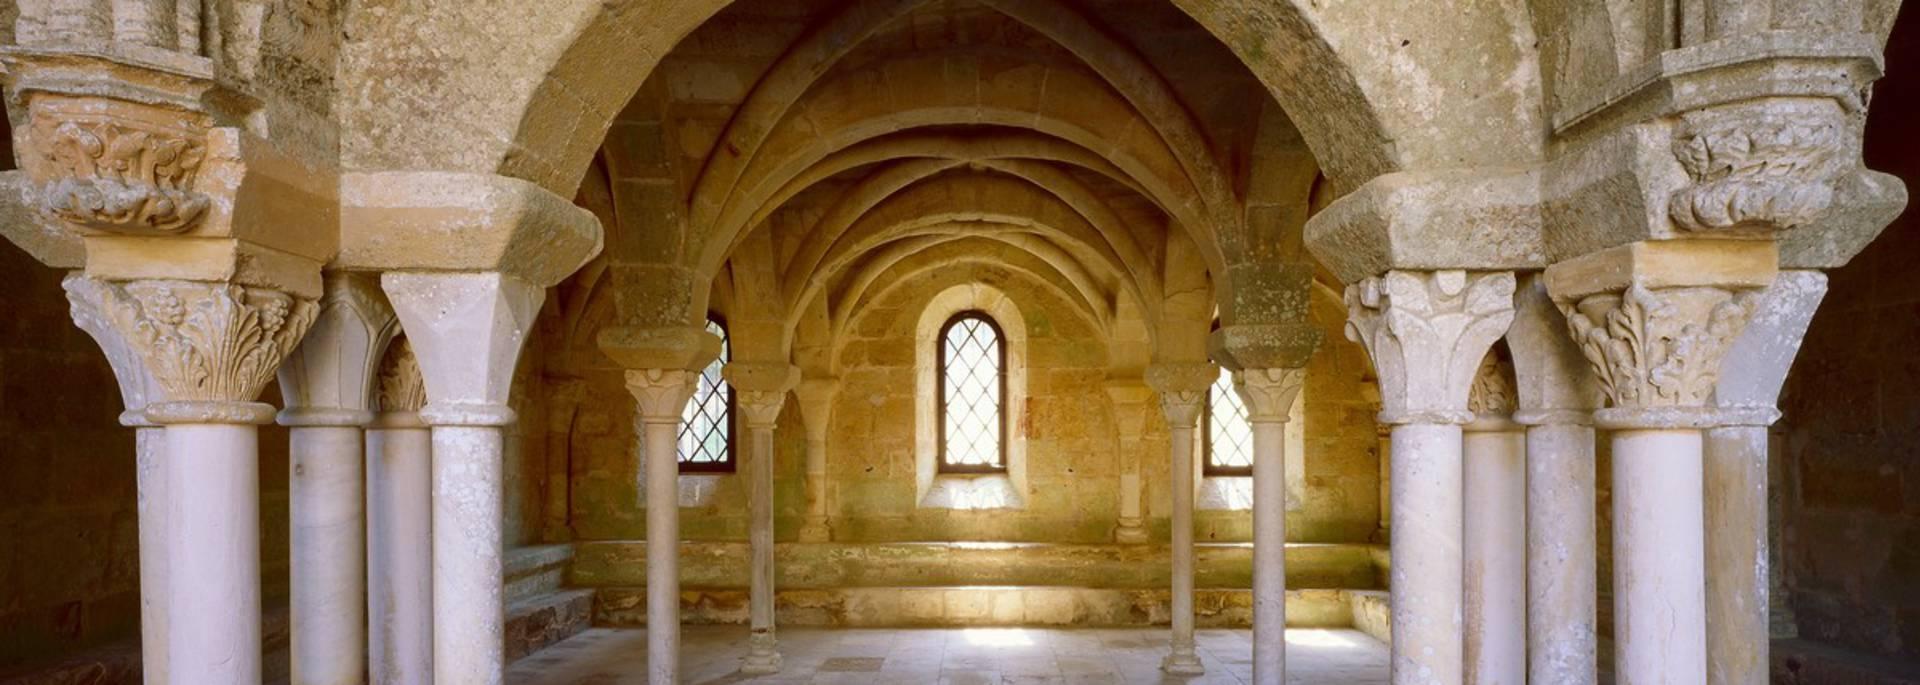 Abbaye de Fontfroide, salle capitulaire